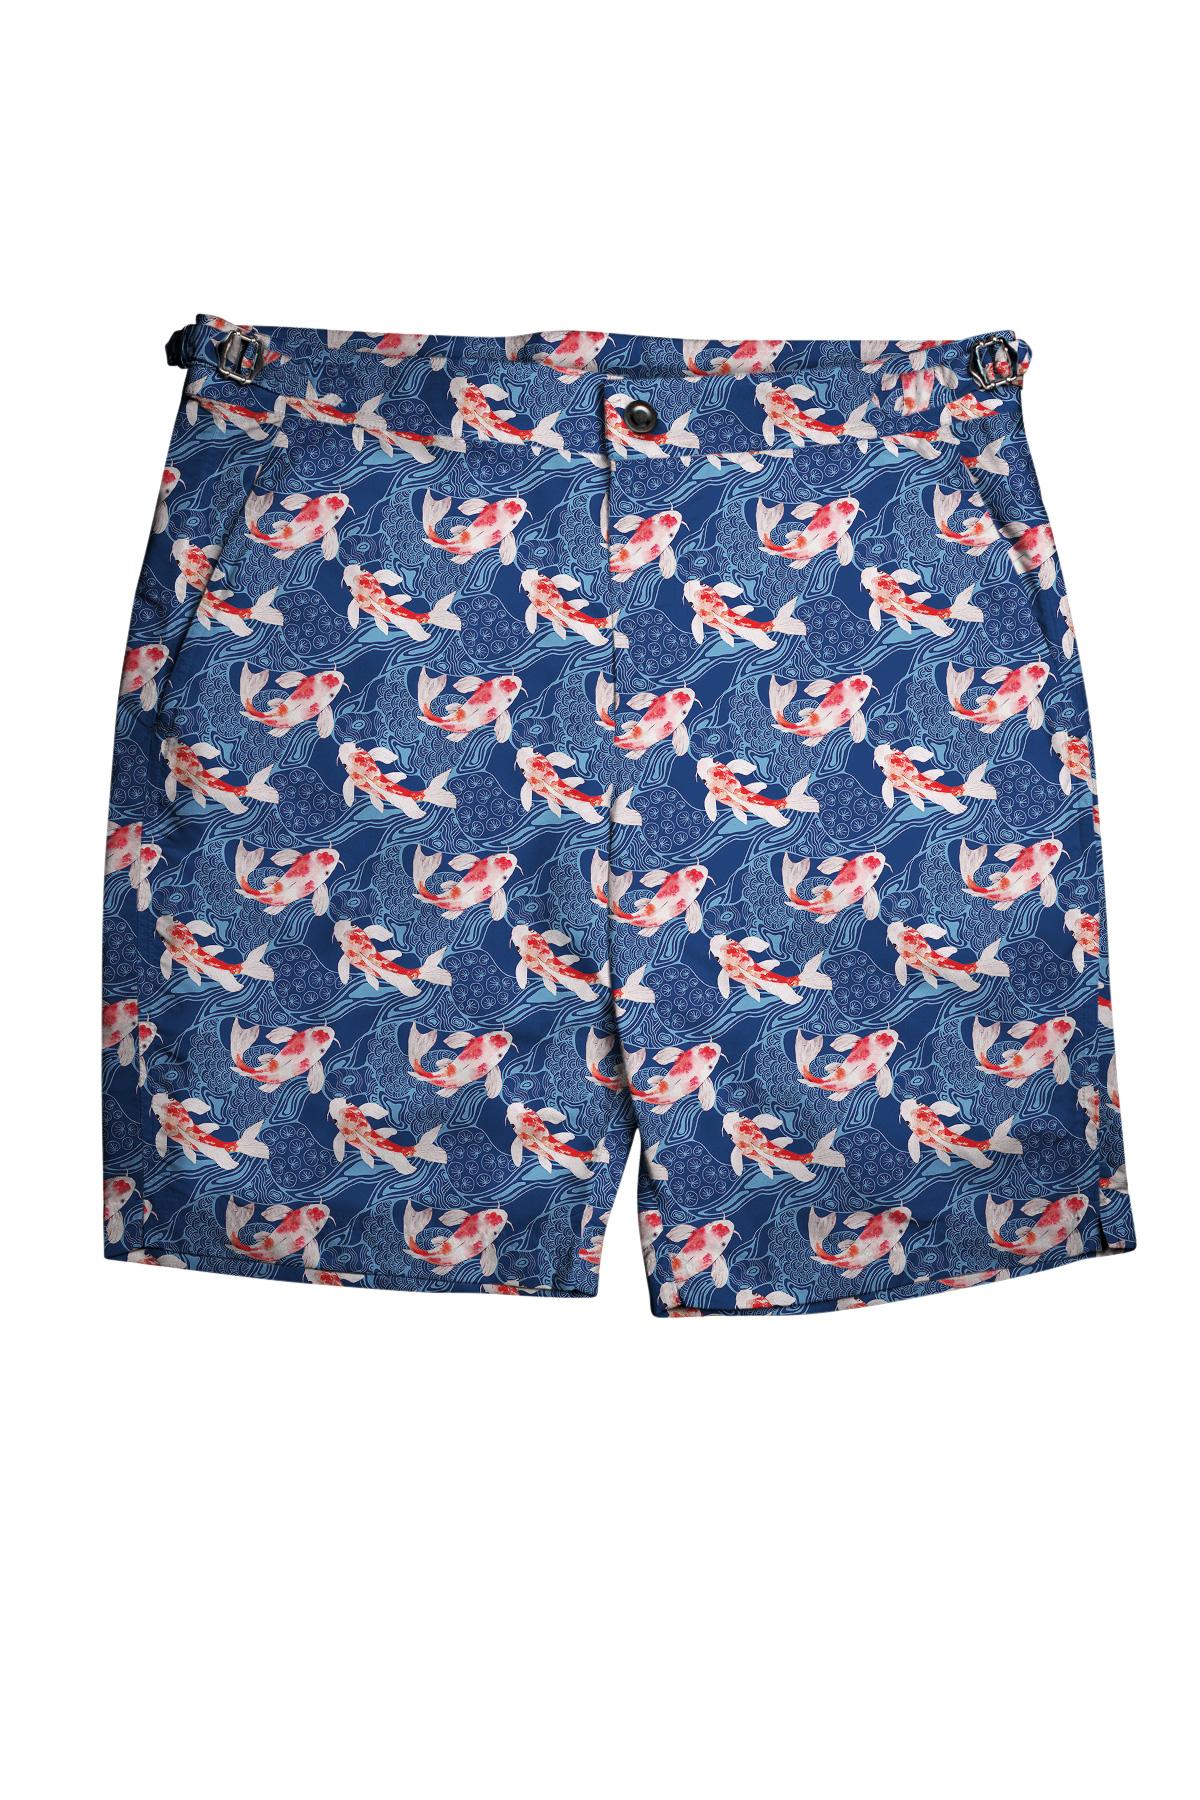 Blue & Red Koi Fish Swim Shorts